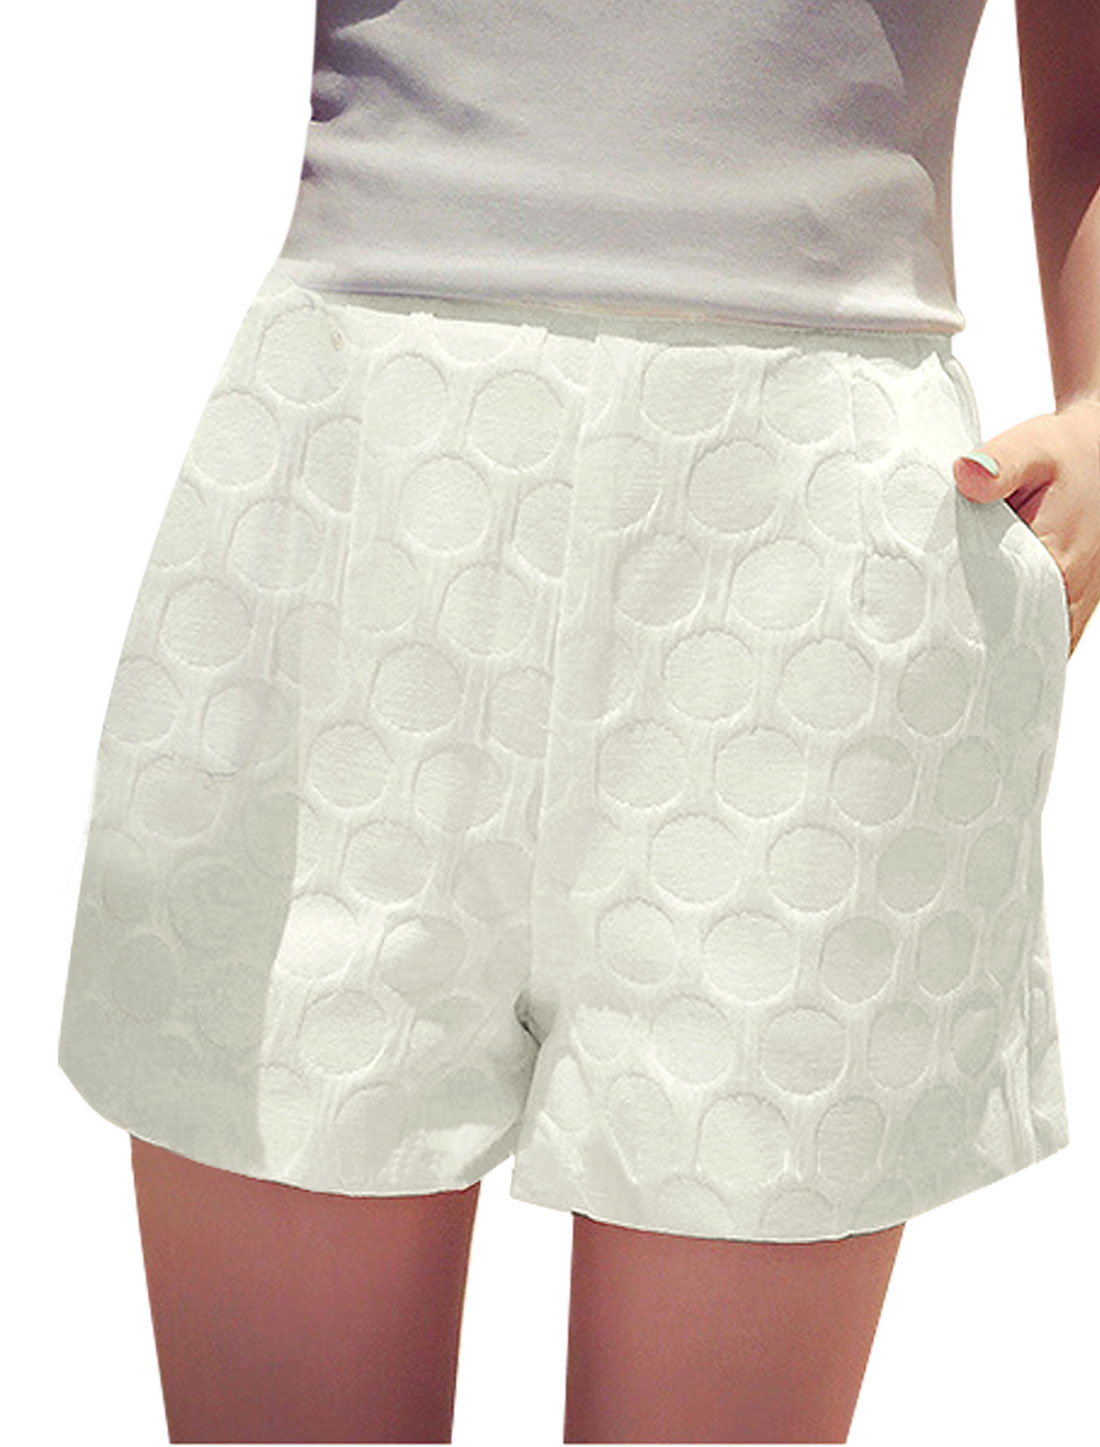 Ladies Textured Slant Pockets Front High Waist Shorts White S